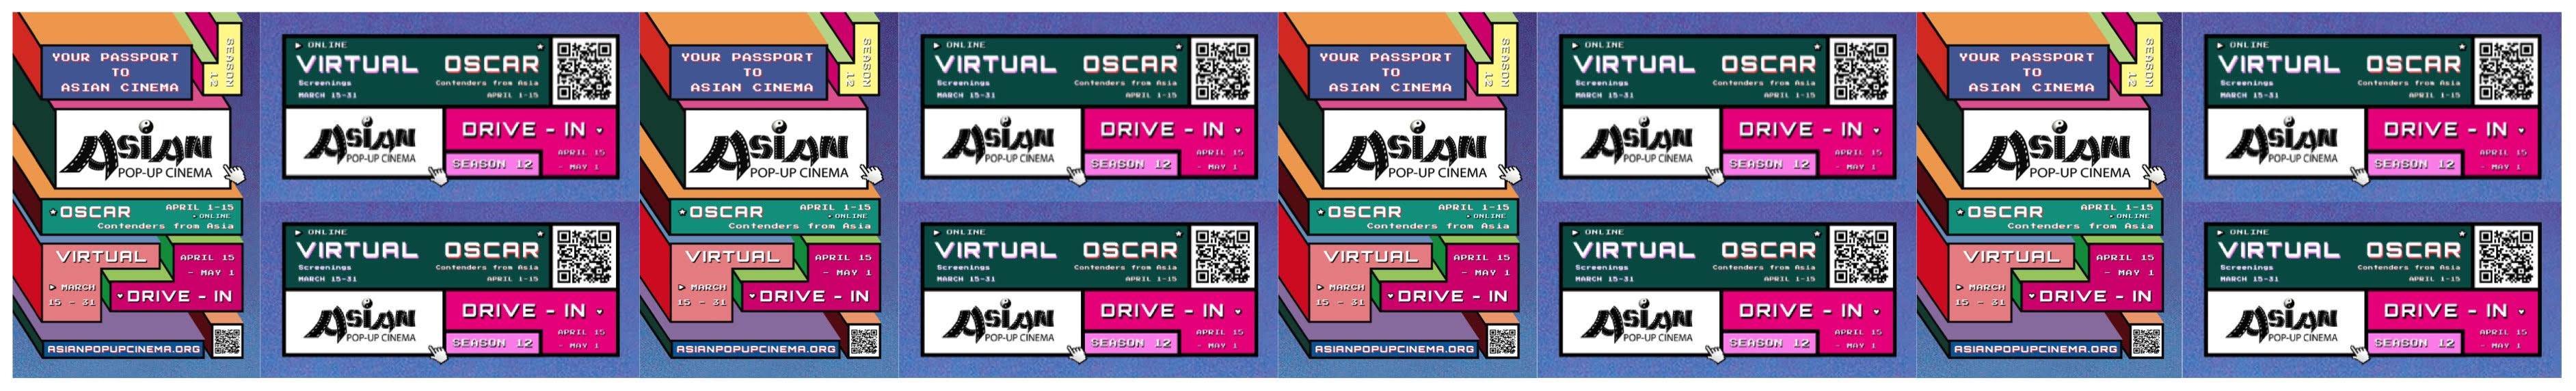 Asian Pop-Up Cinema Season 12